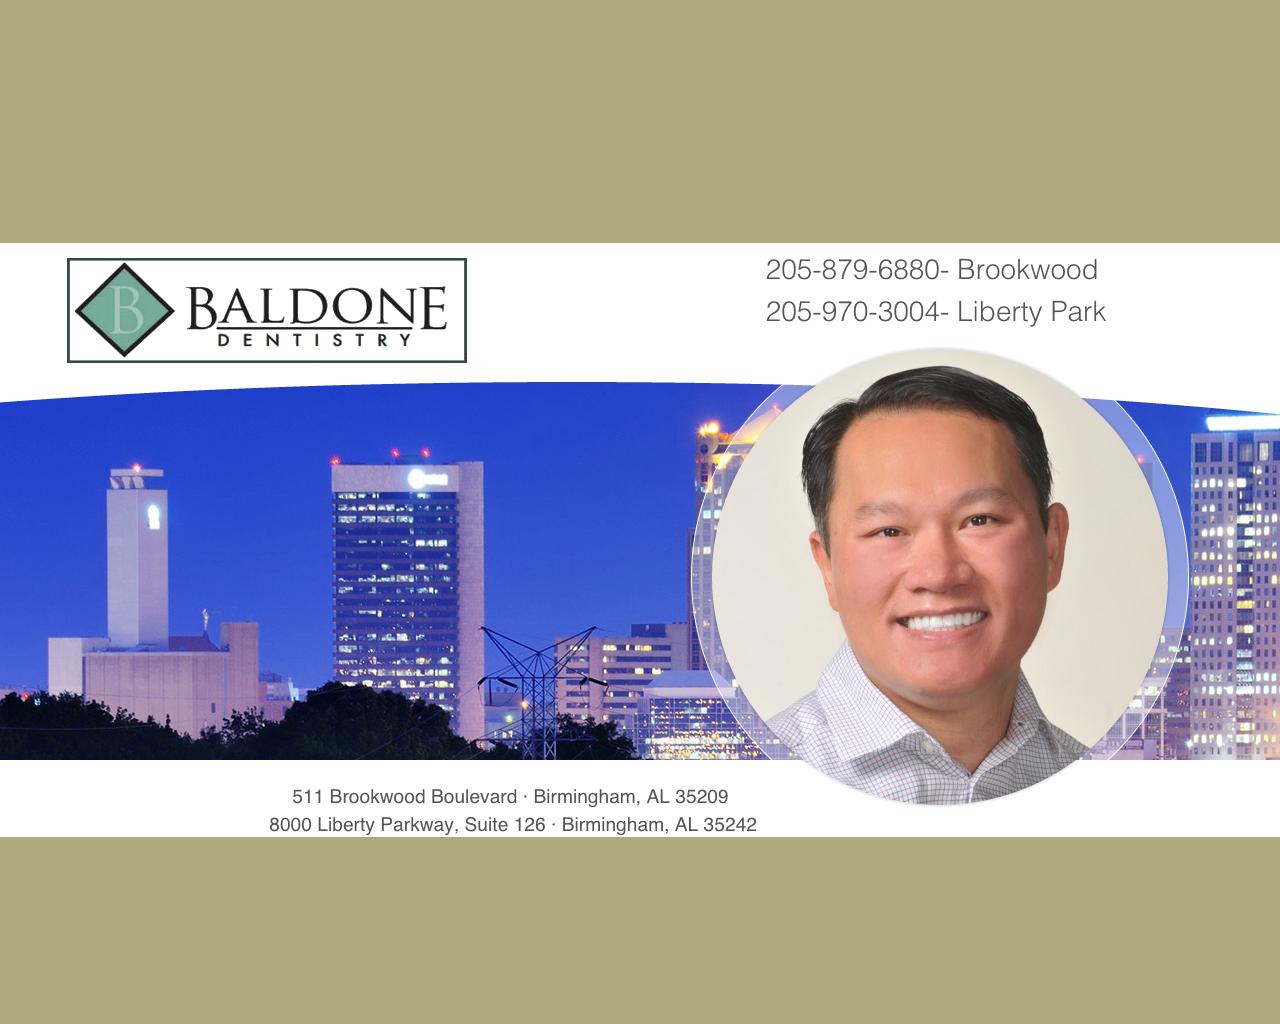 Baldone Dentistry  | Brookwood